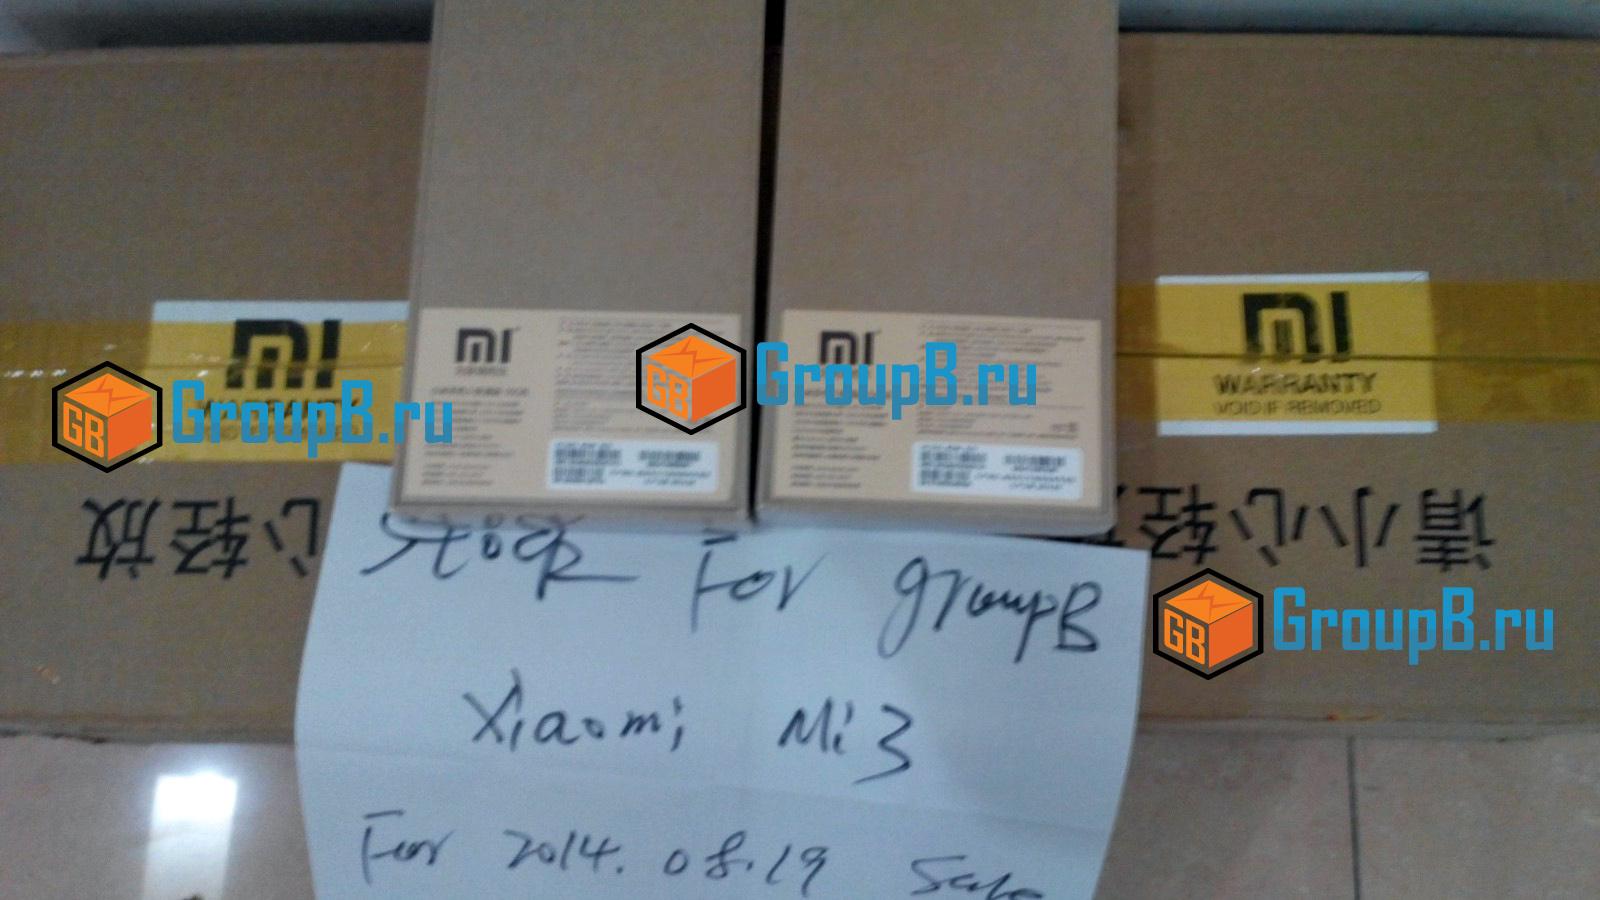 xiaomi mi4 stock